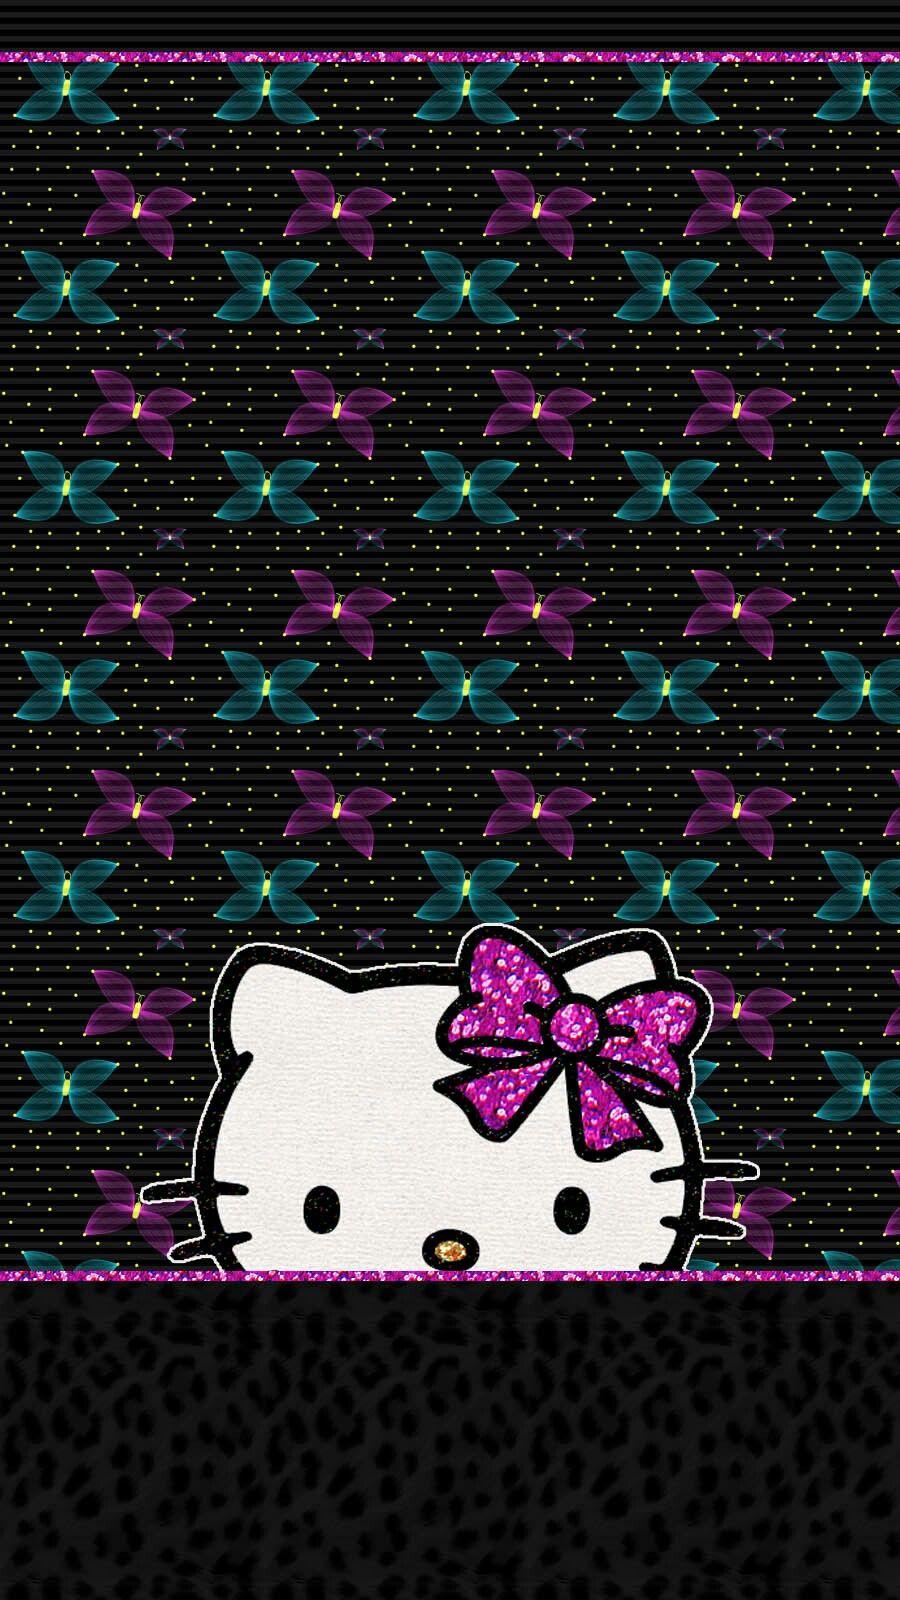 Hk wallpaper iphone Hello kitty backgrounds, Hello kitty